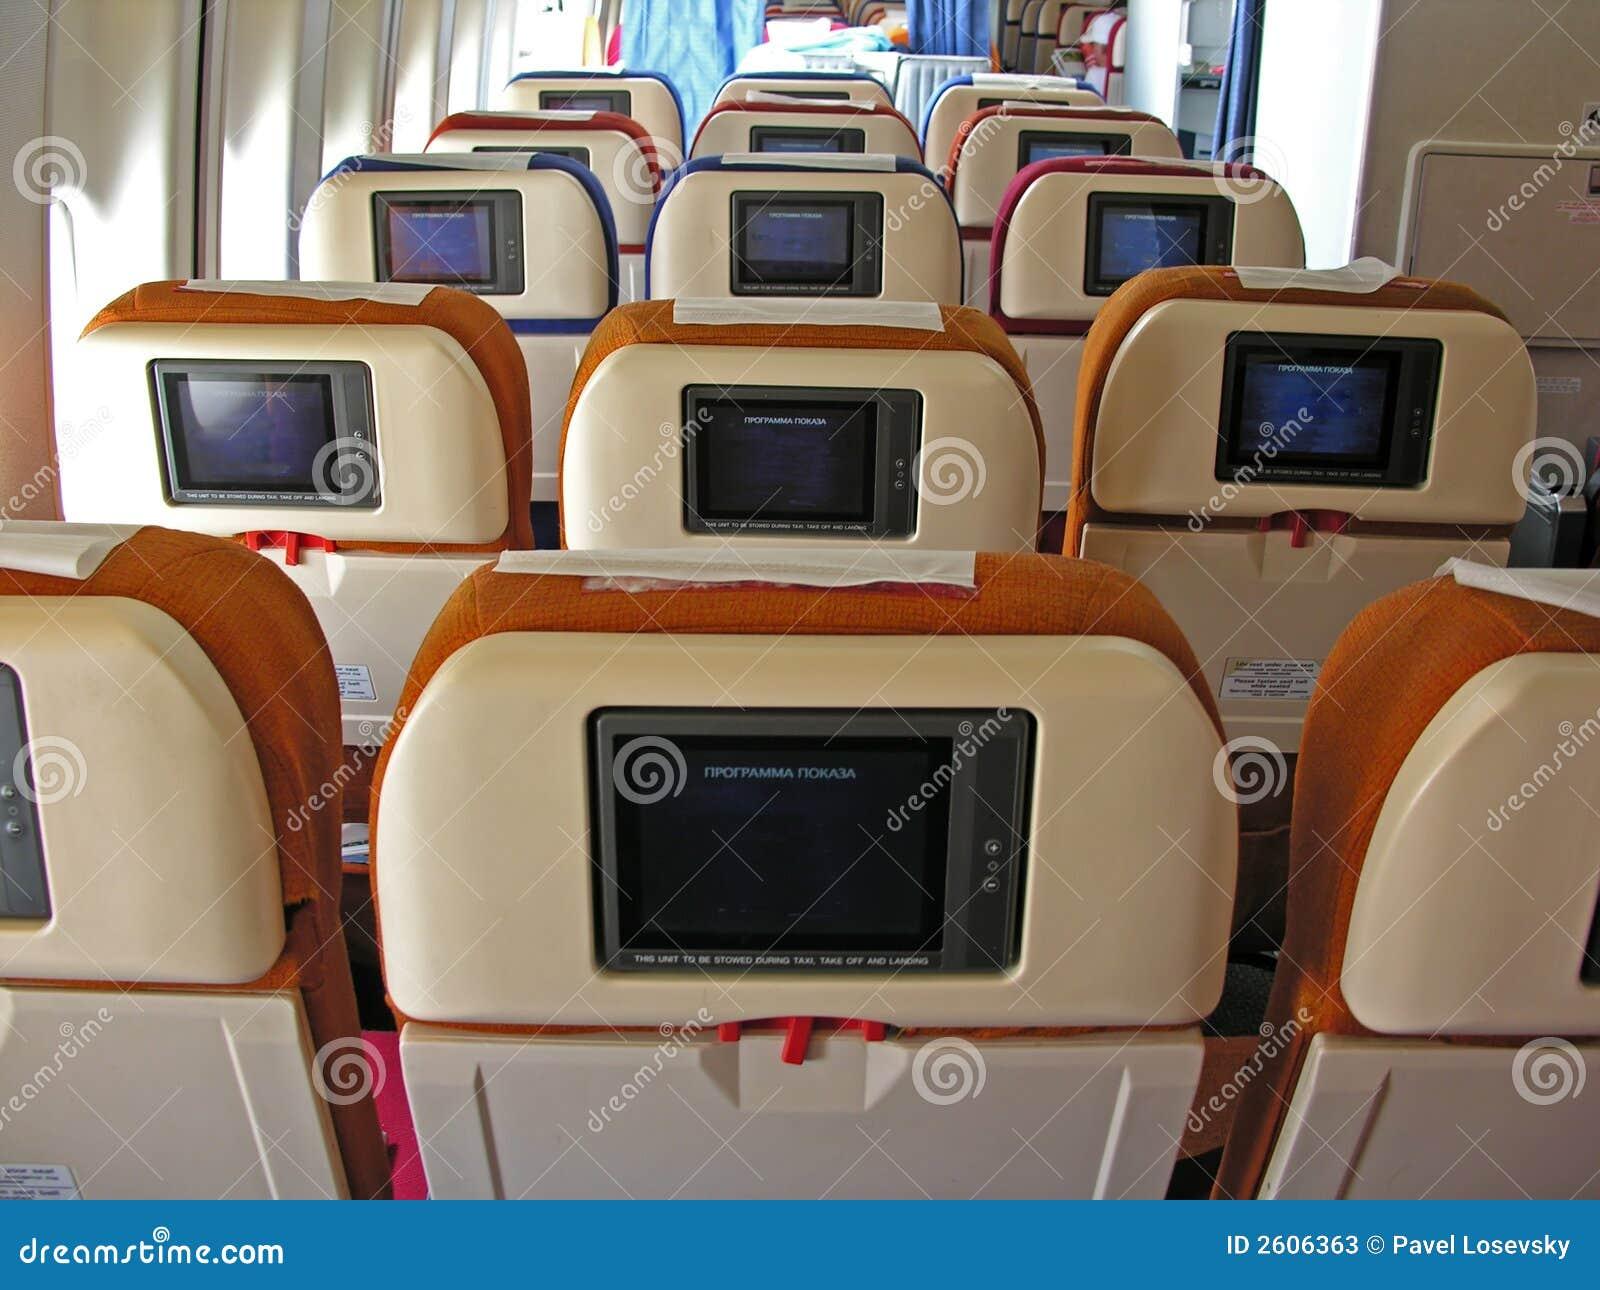 Airplane salon